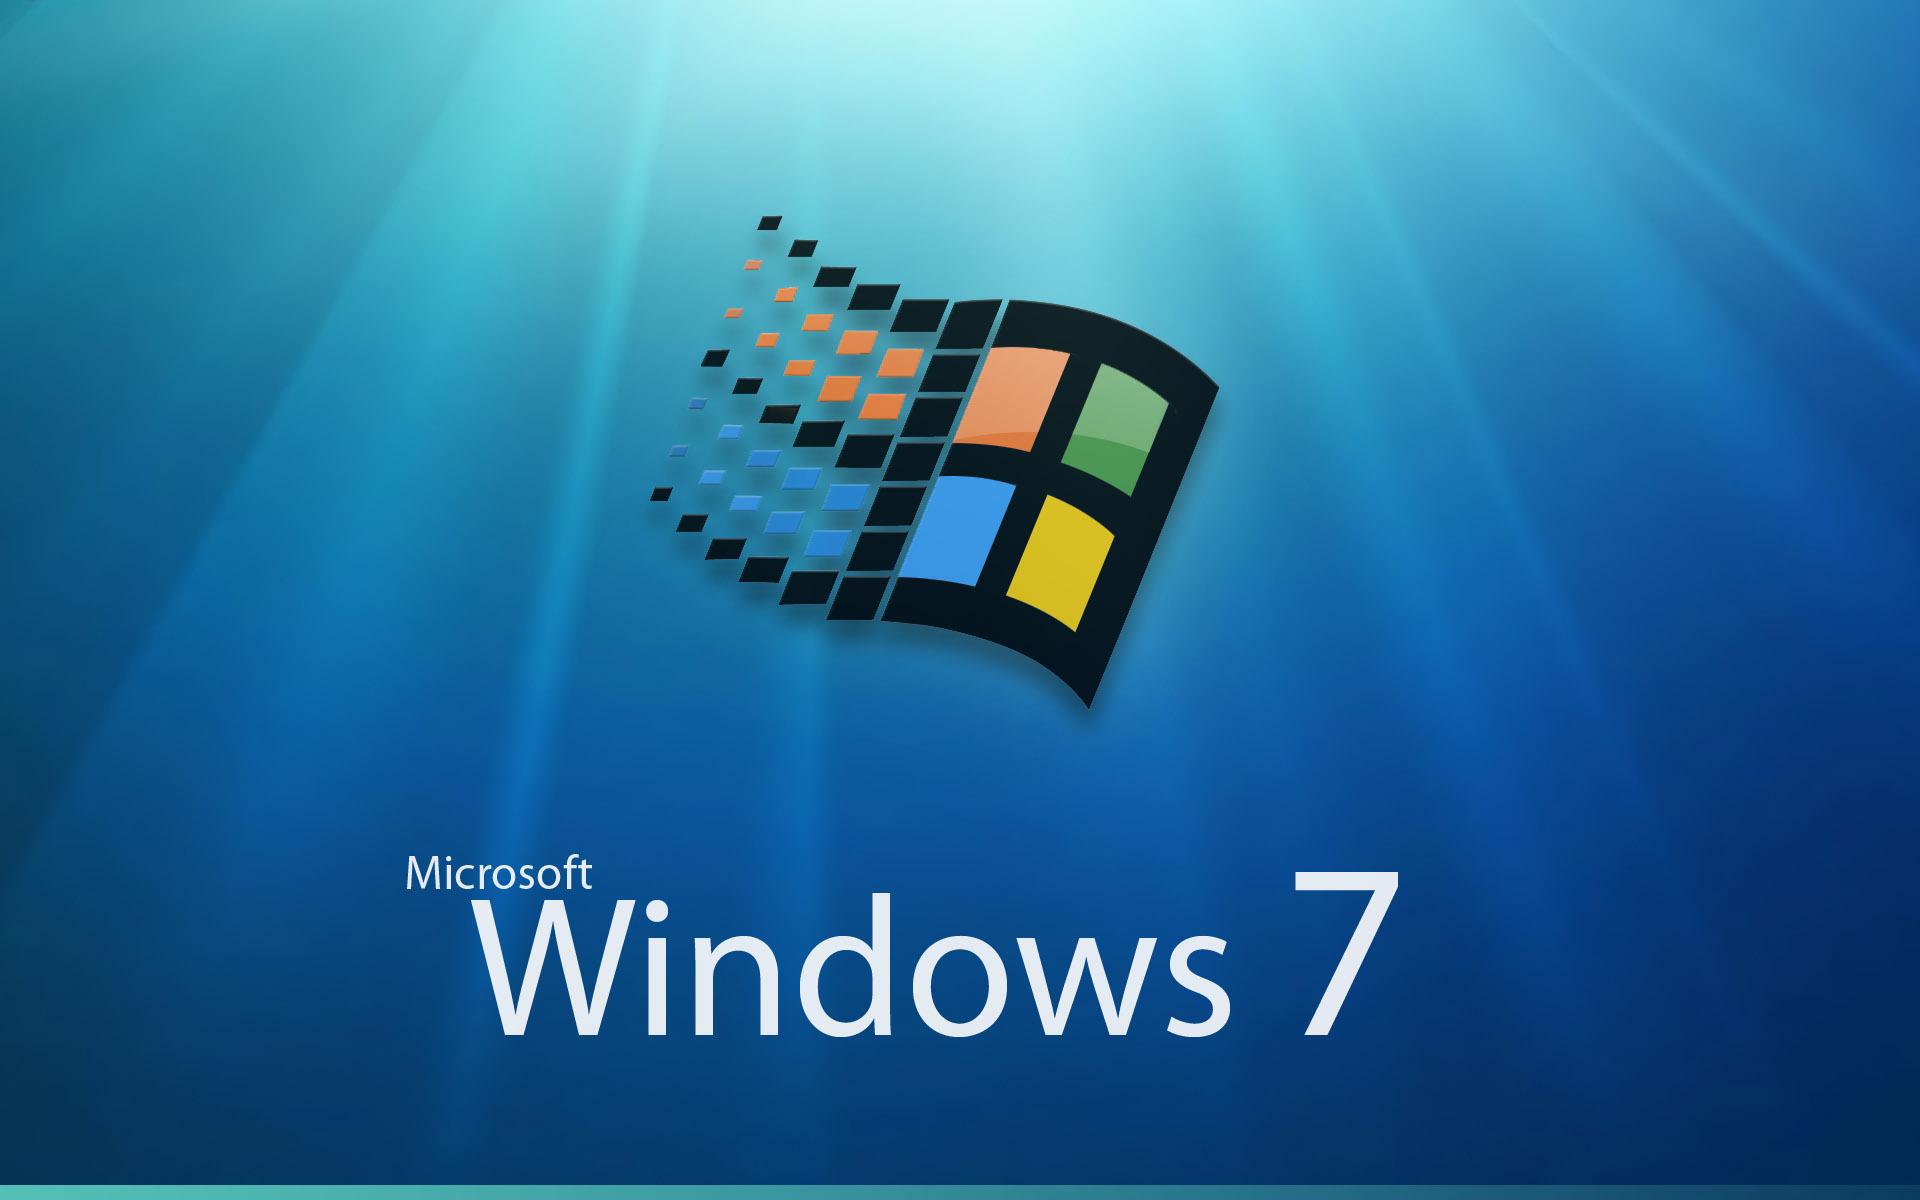 windows 7 ultimate wallpaper_14. windows-seven-wallpaper-14